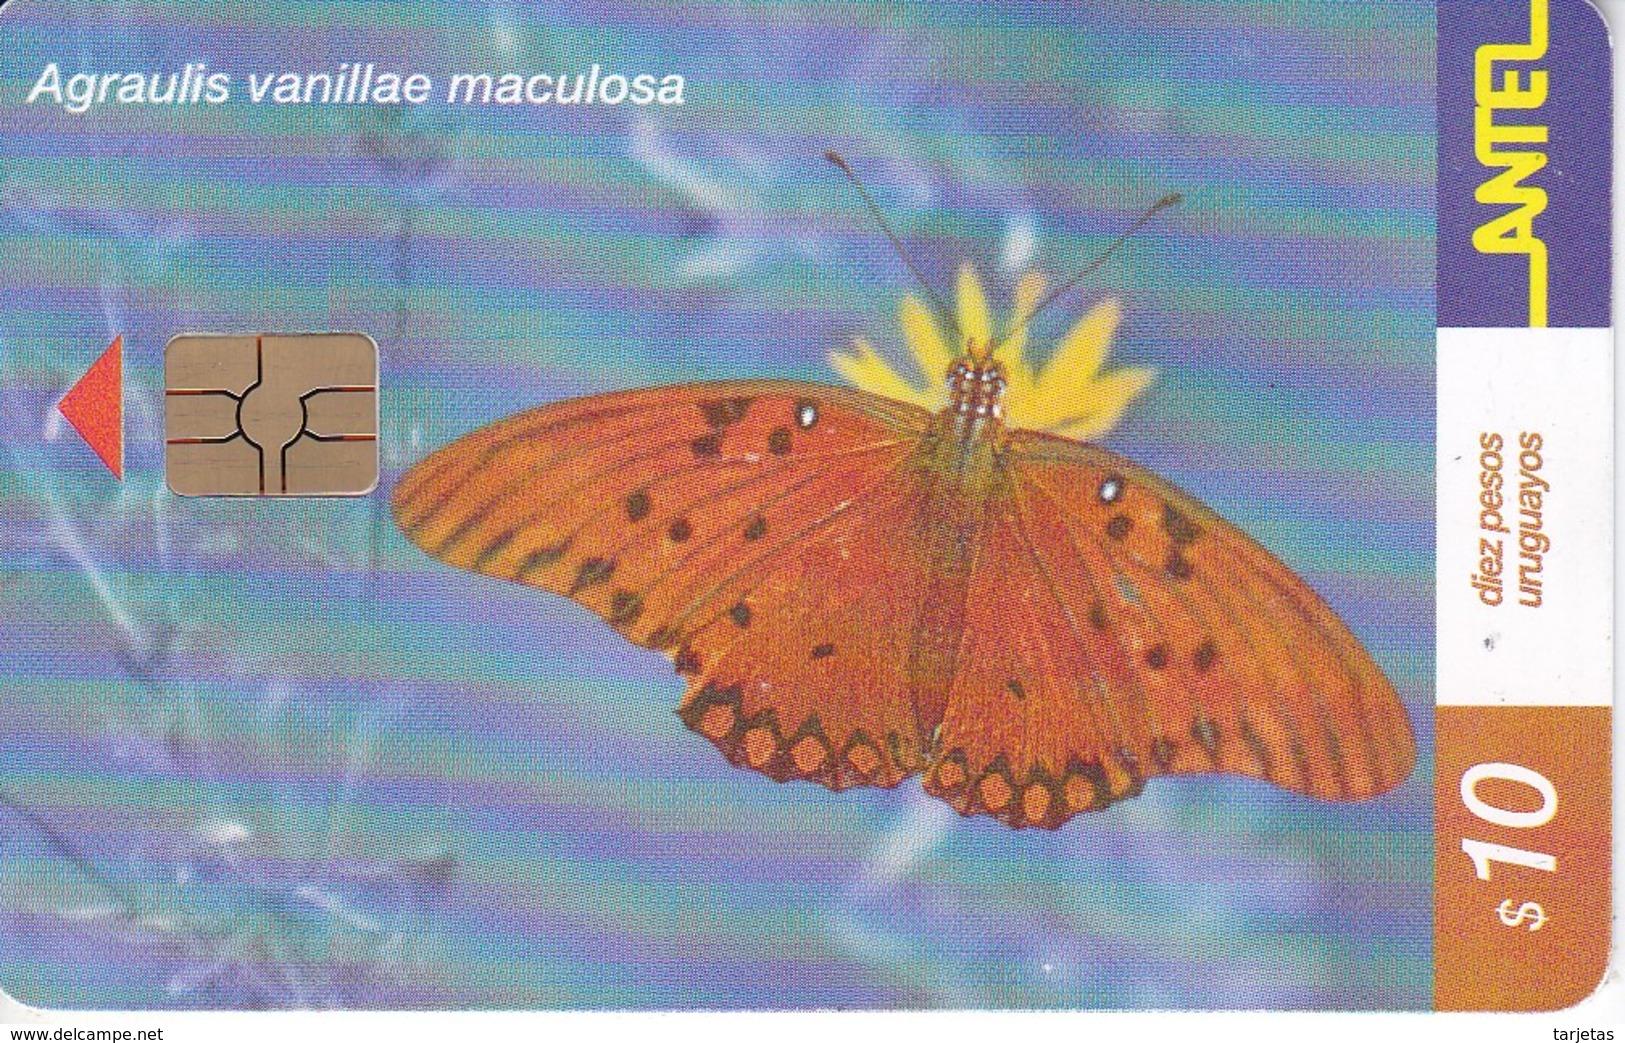 Nº 183 TARJETA DE URUGUAY DE ANTEL DE UNA AGRAULIS VANILLAE (MARIPOSA-BUTTERFLY) CHIP ROJO - Uruguay